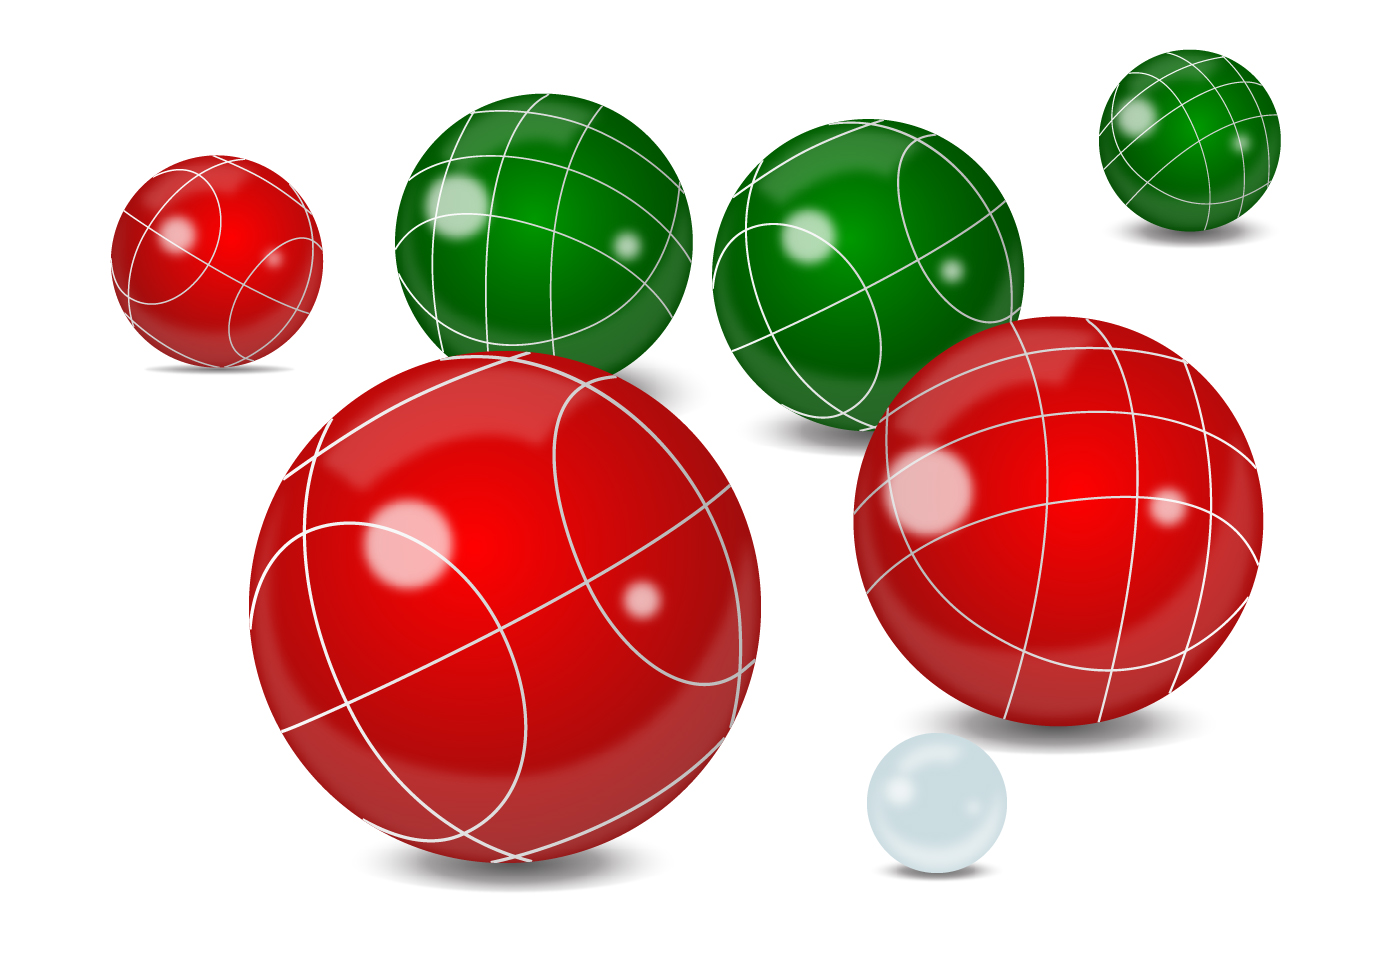 bocce ball free vector art 4670 free downloads rh vecteezy com bocceball clip art for black t-shirts Bocce Ball Cartoon